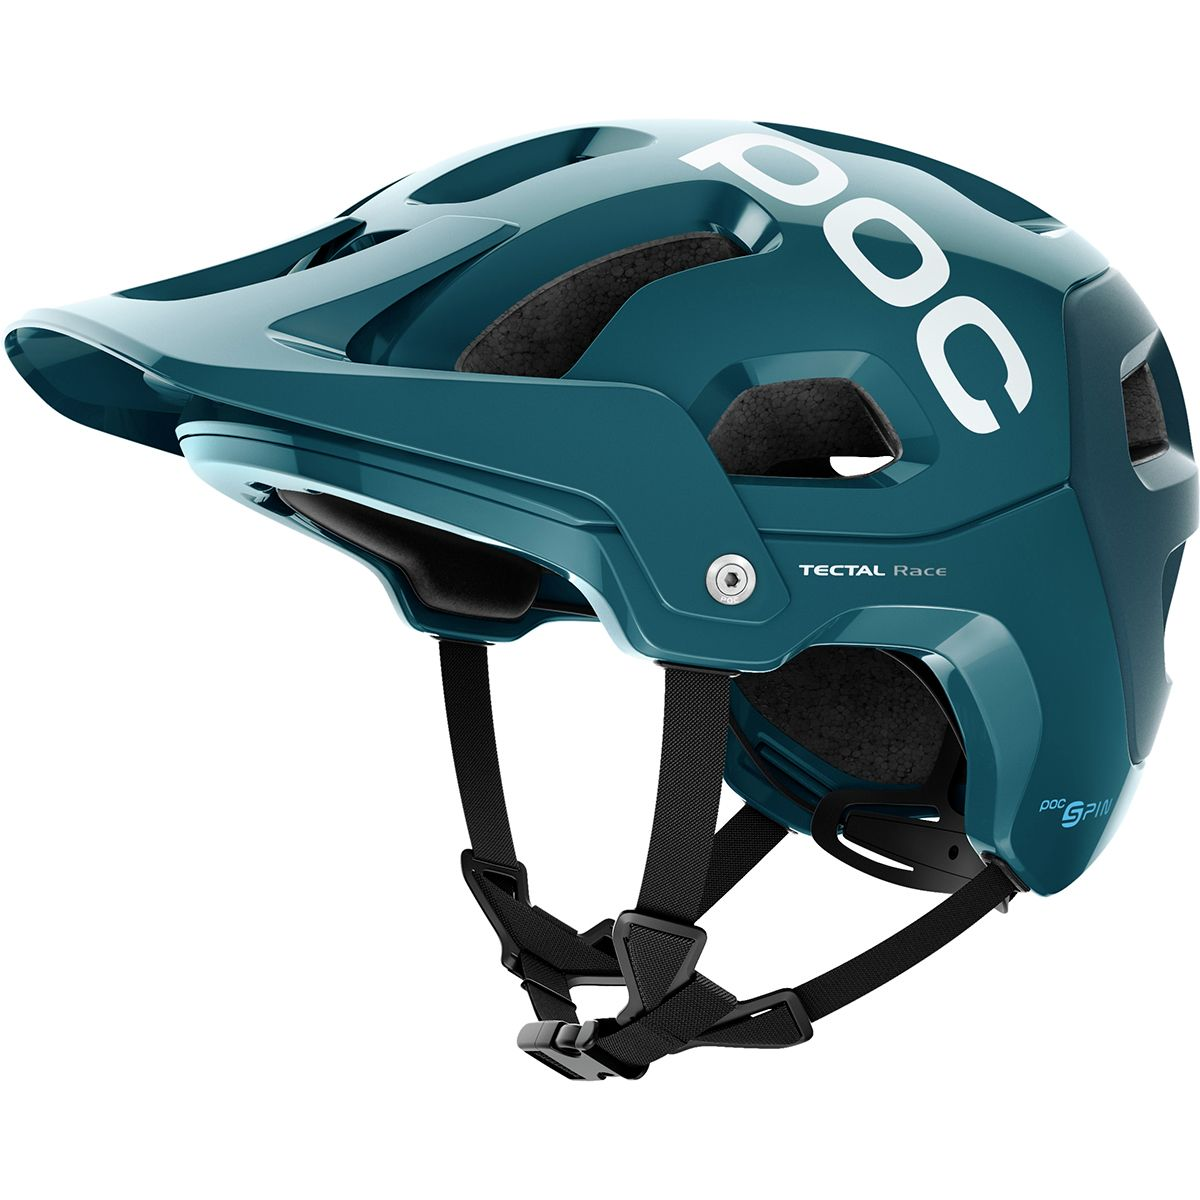 POC - Tectal Race Spin Helmet - Antimony Blue